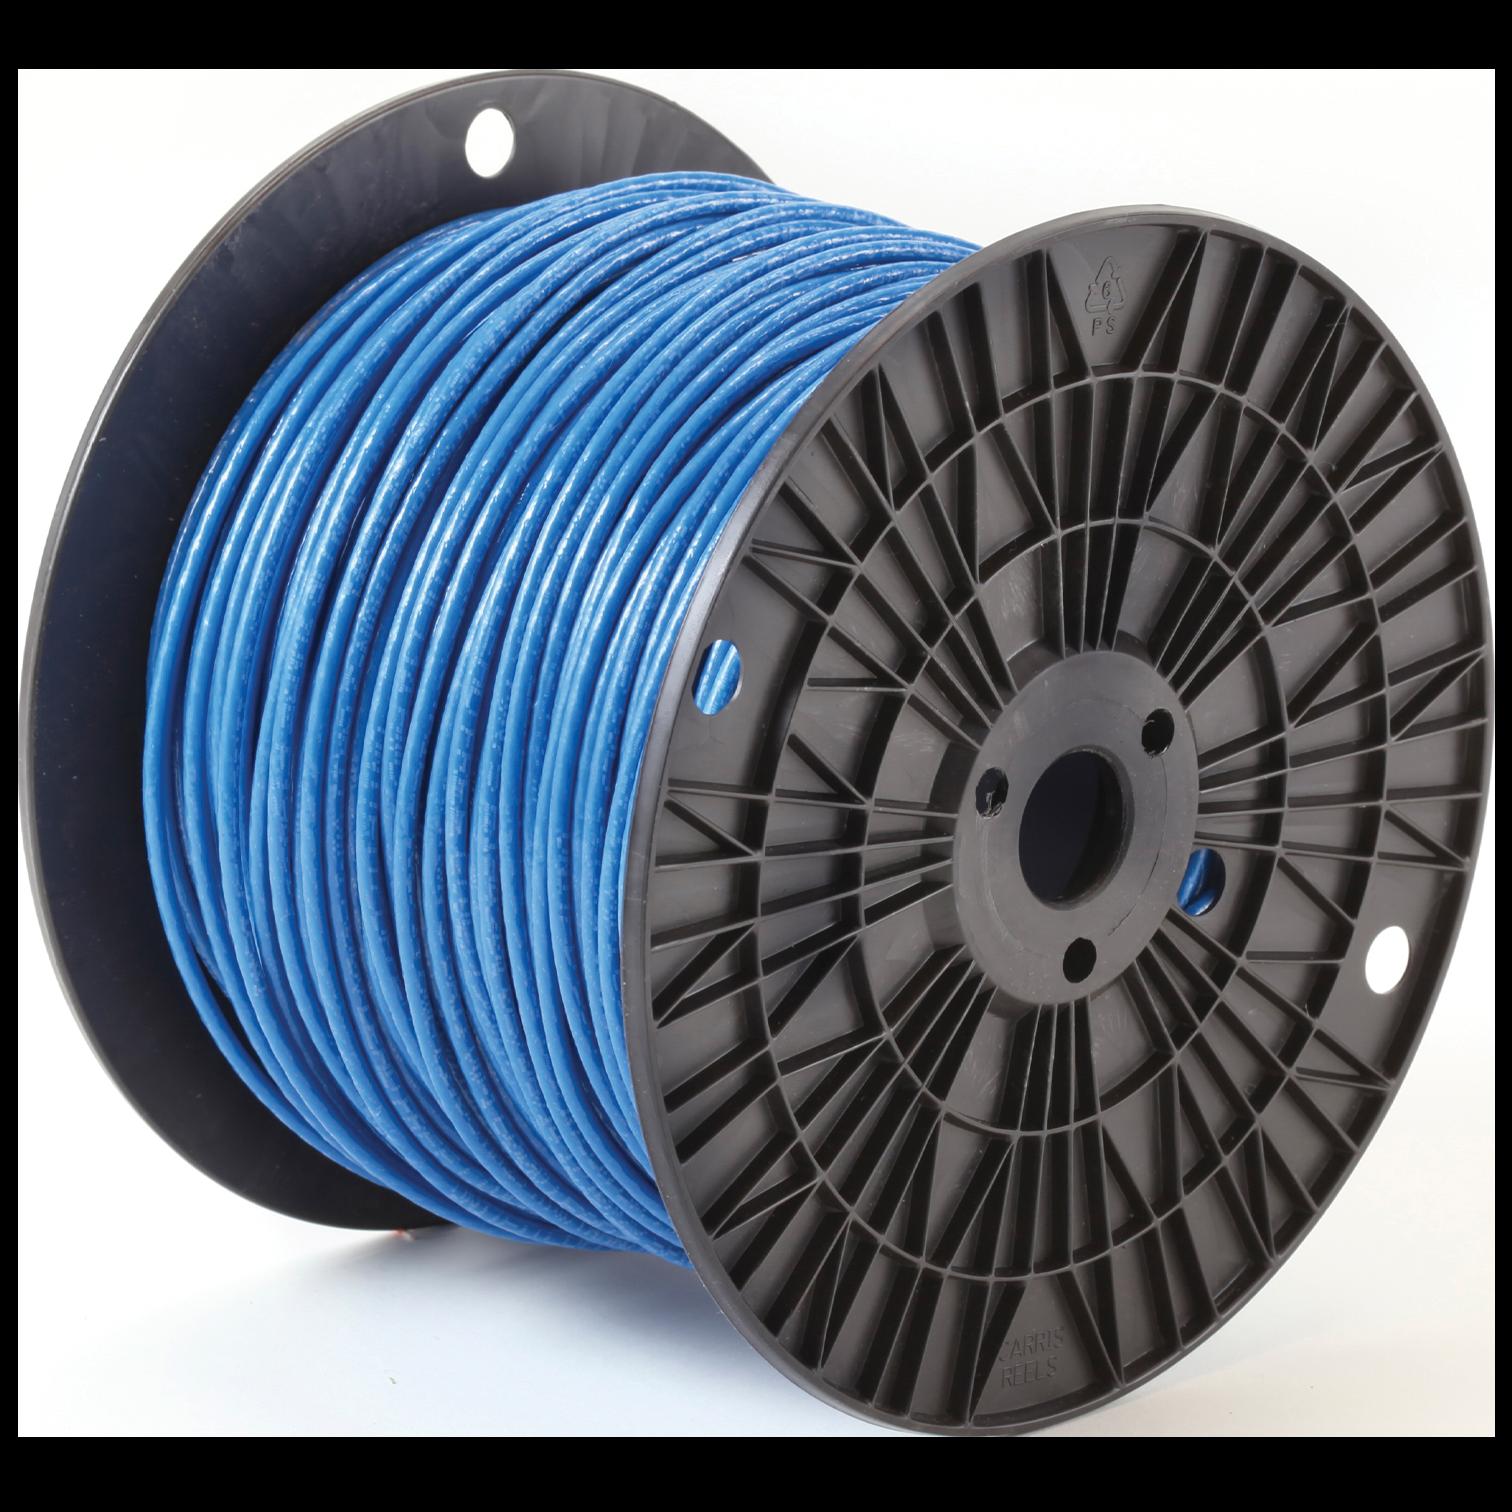 THHN 12 STR BLUE 500/SPL